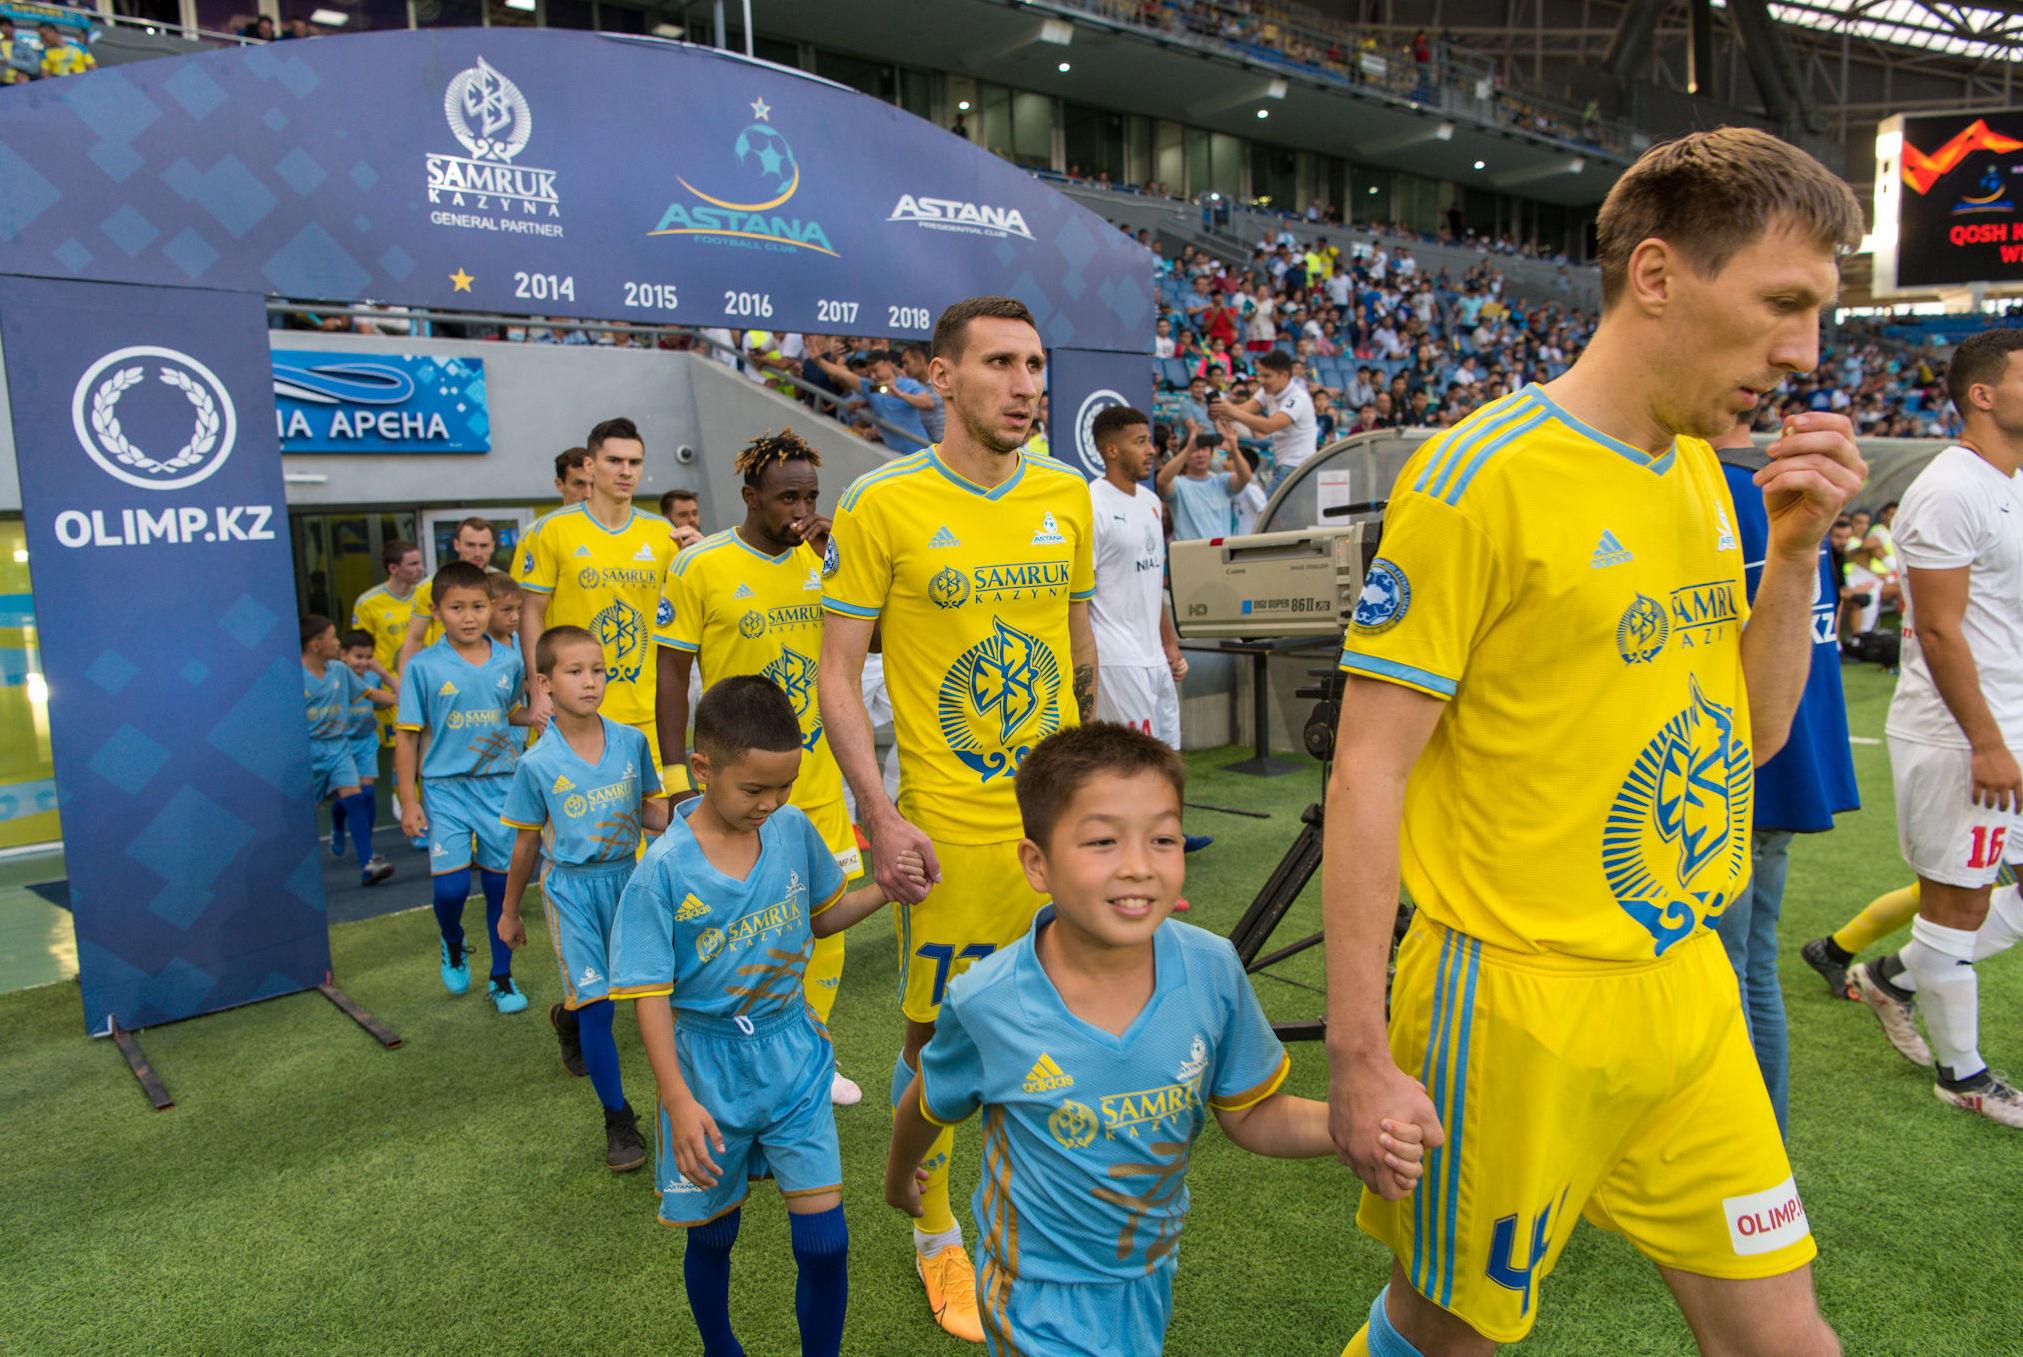 Матч Астана - Валетта прошел на столичном футбольном стадионе Астана Арена